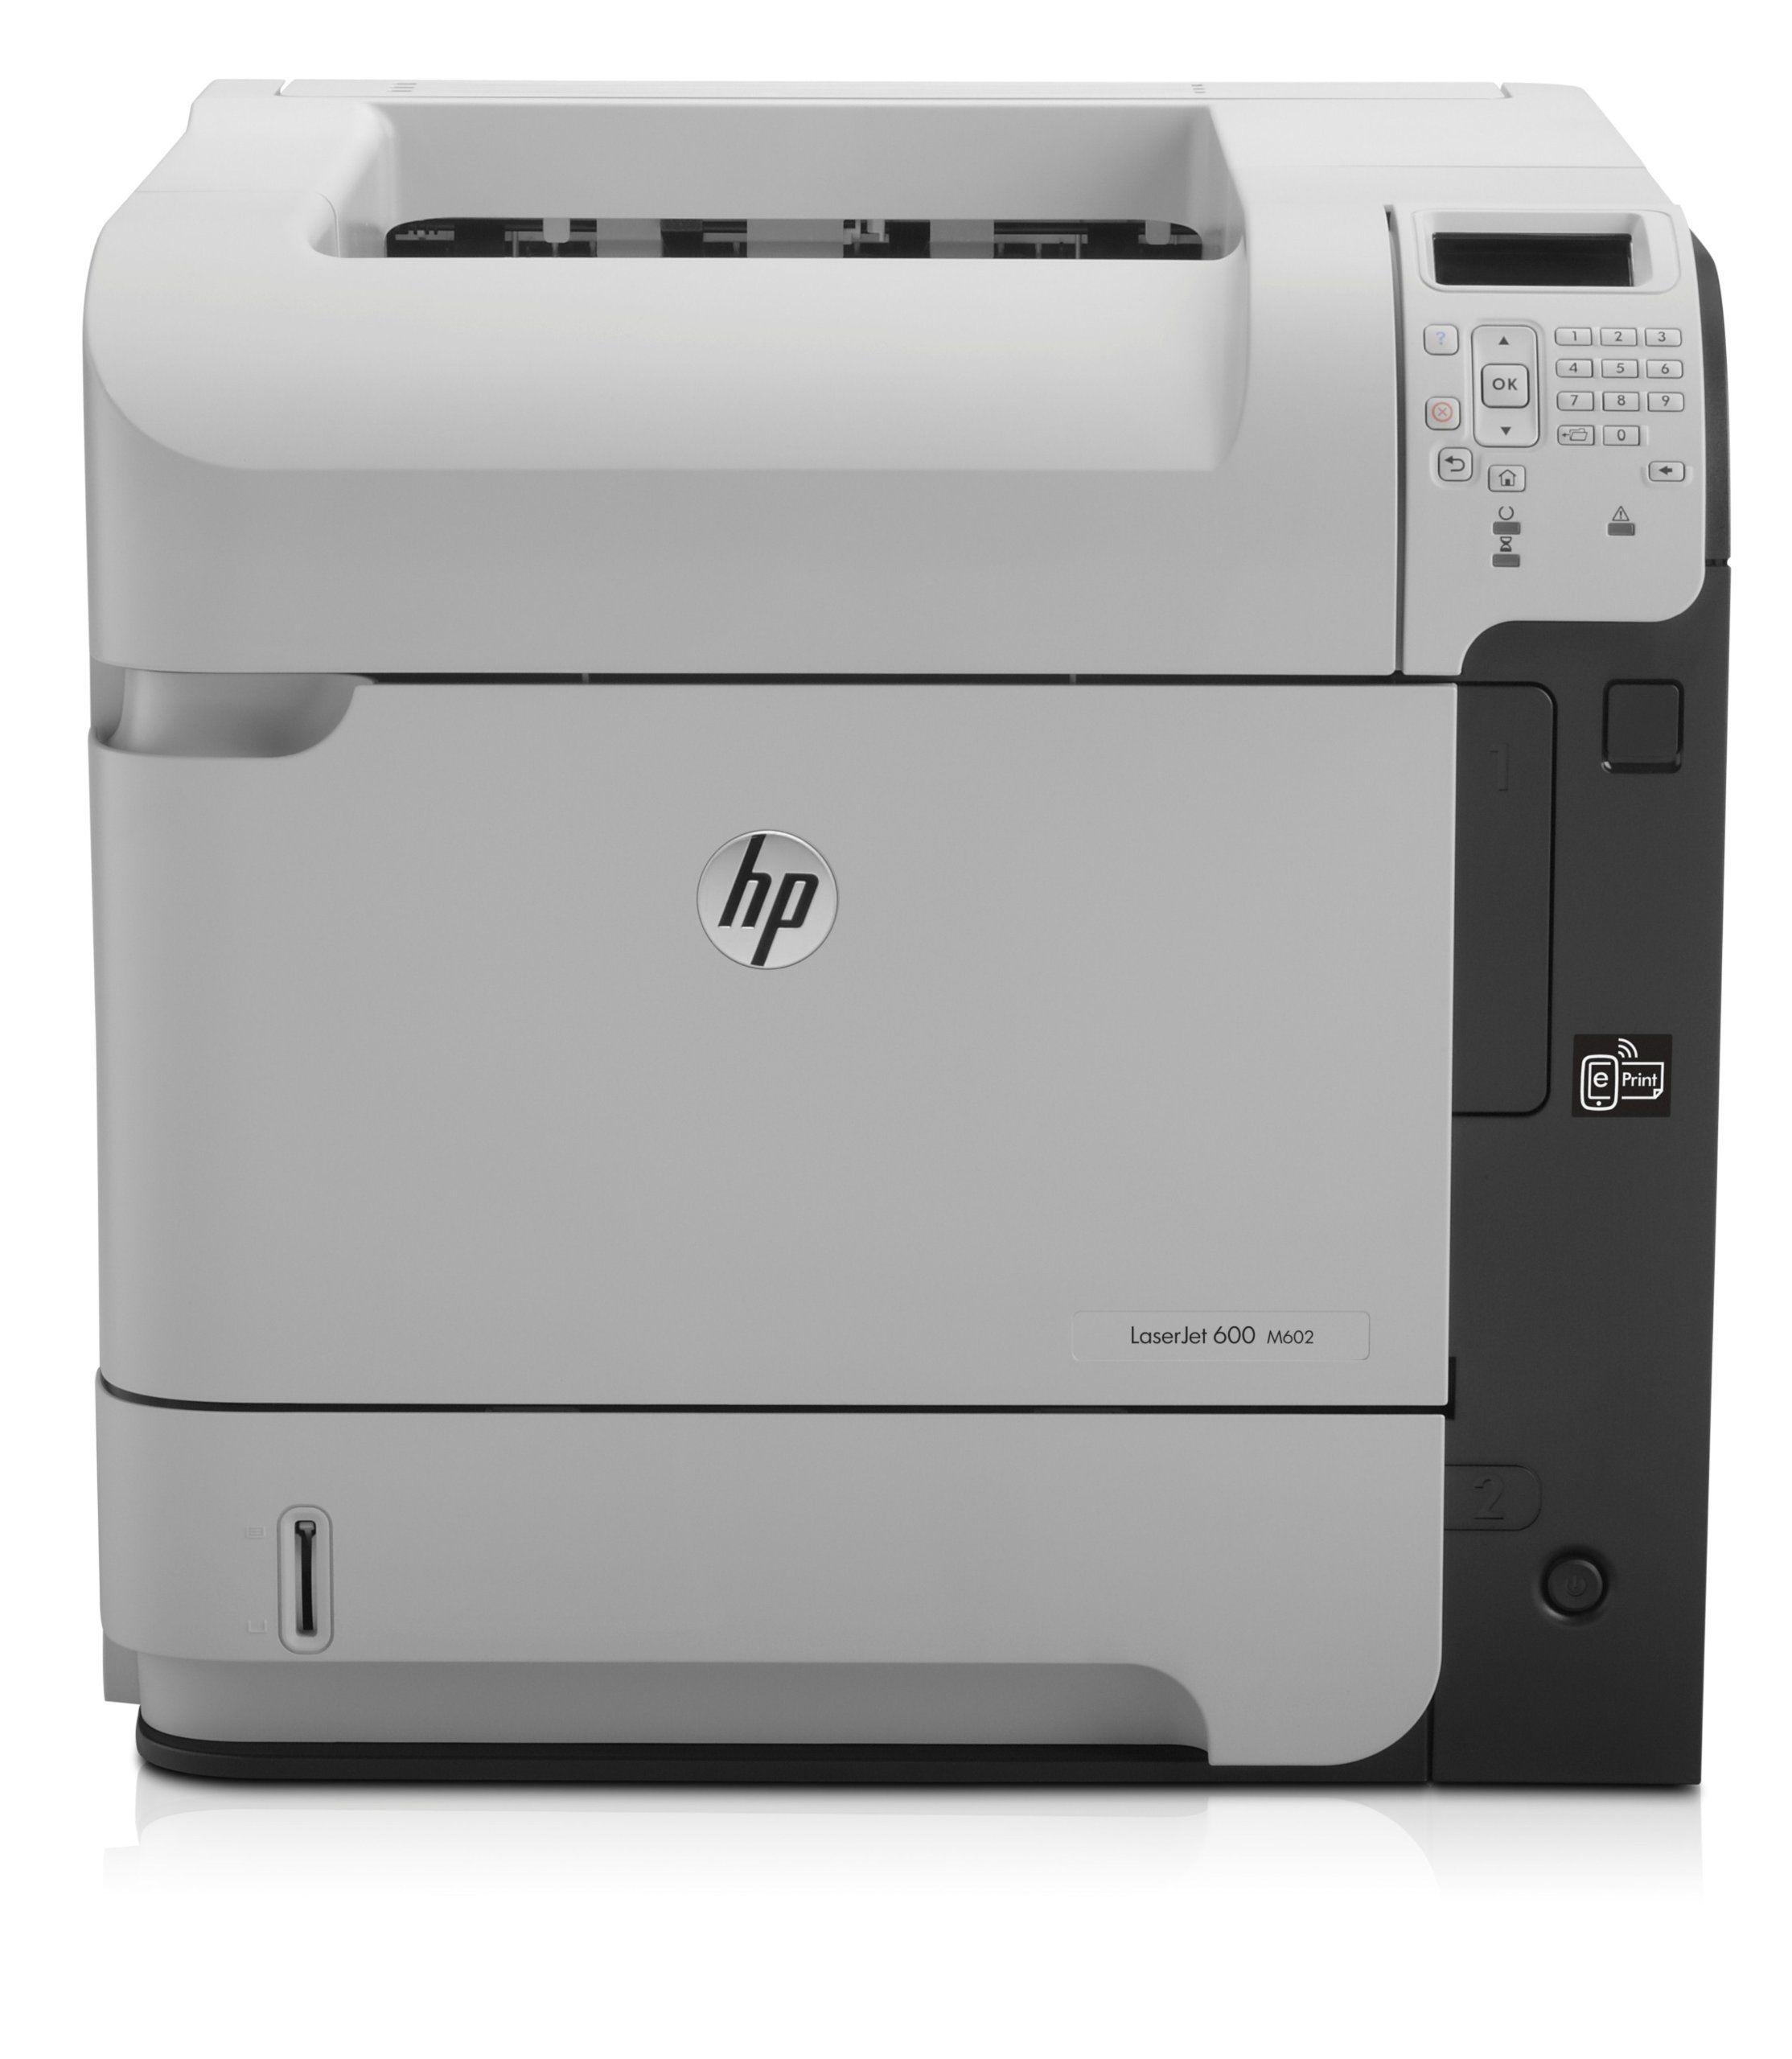 Hp Laserjet Ent 600 M602n Printer Print At Rapid Speeds On A Variety Of Paper Types Produce High Print Volumes With Low Main Hp Printer Laser Printer Printer